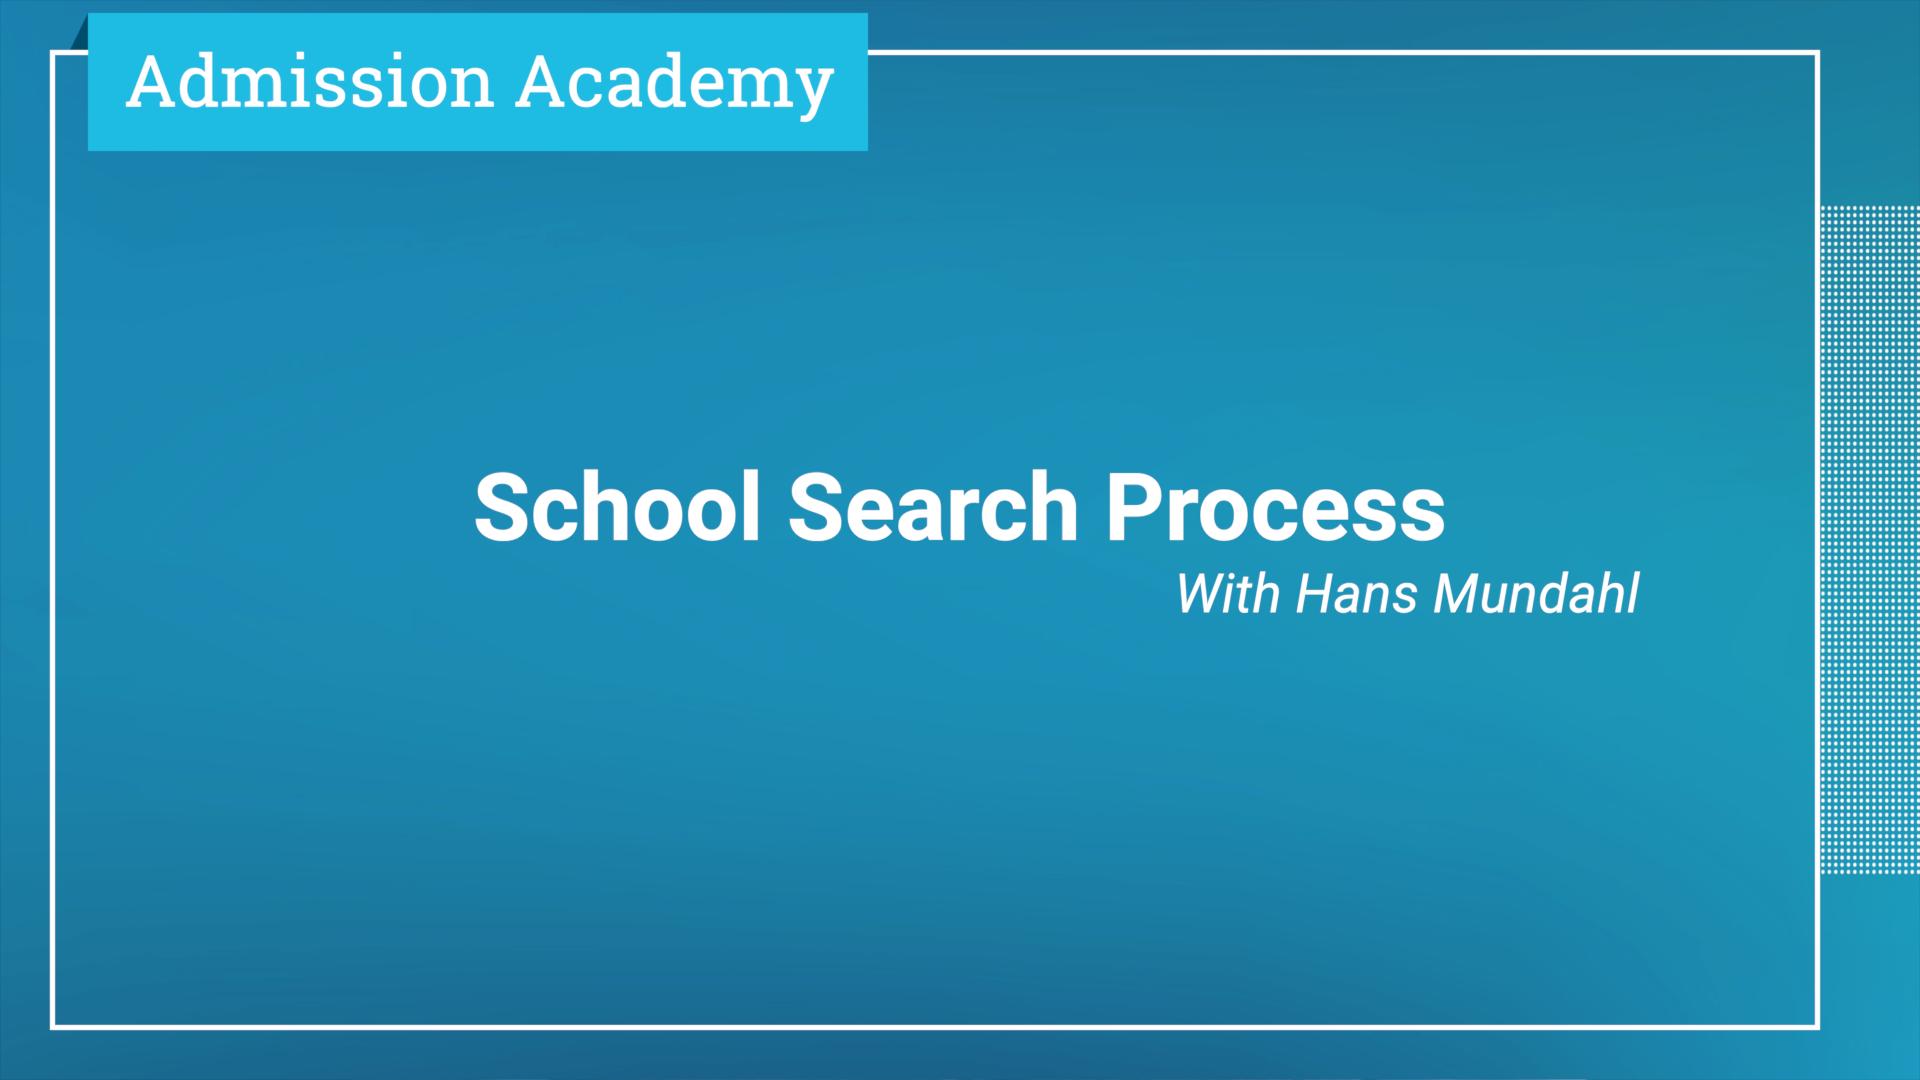 School Search Process